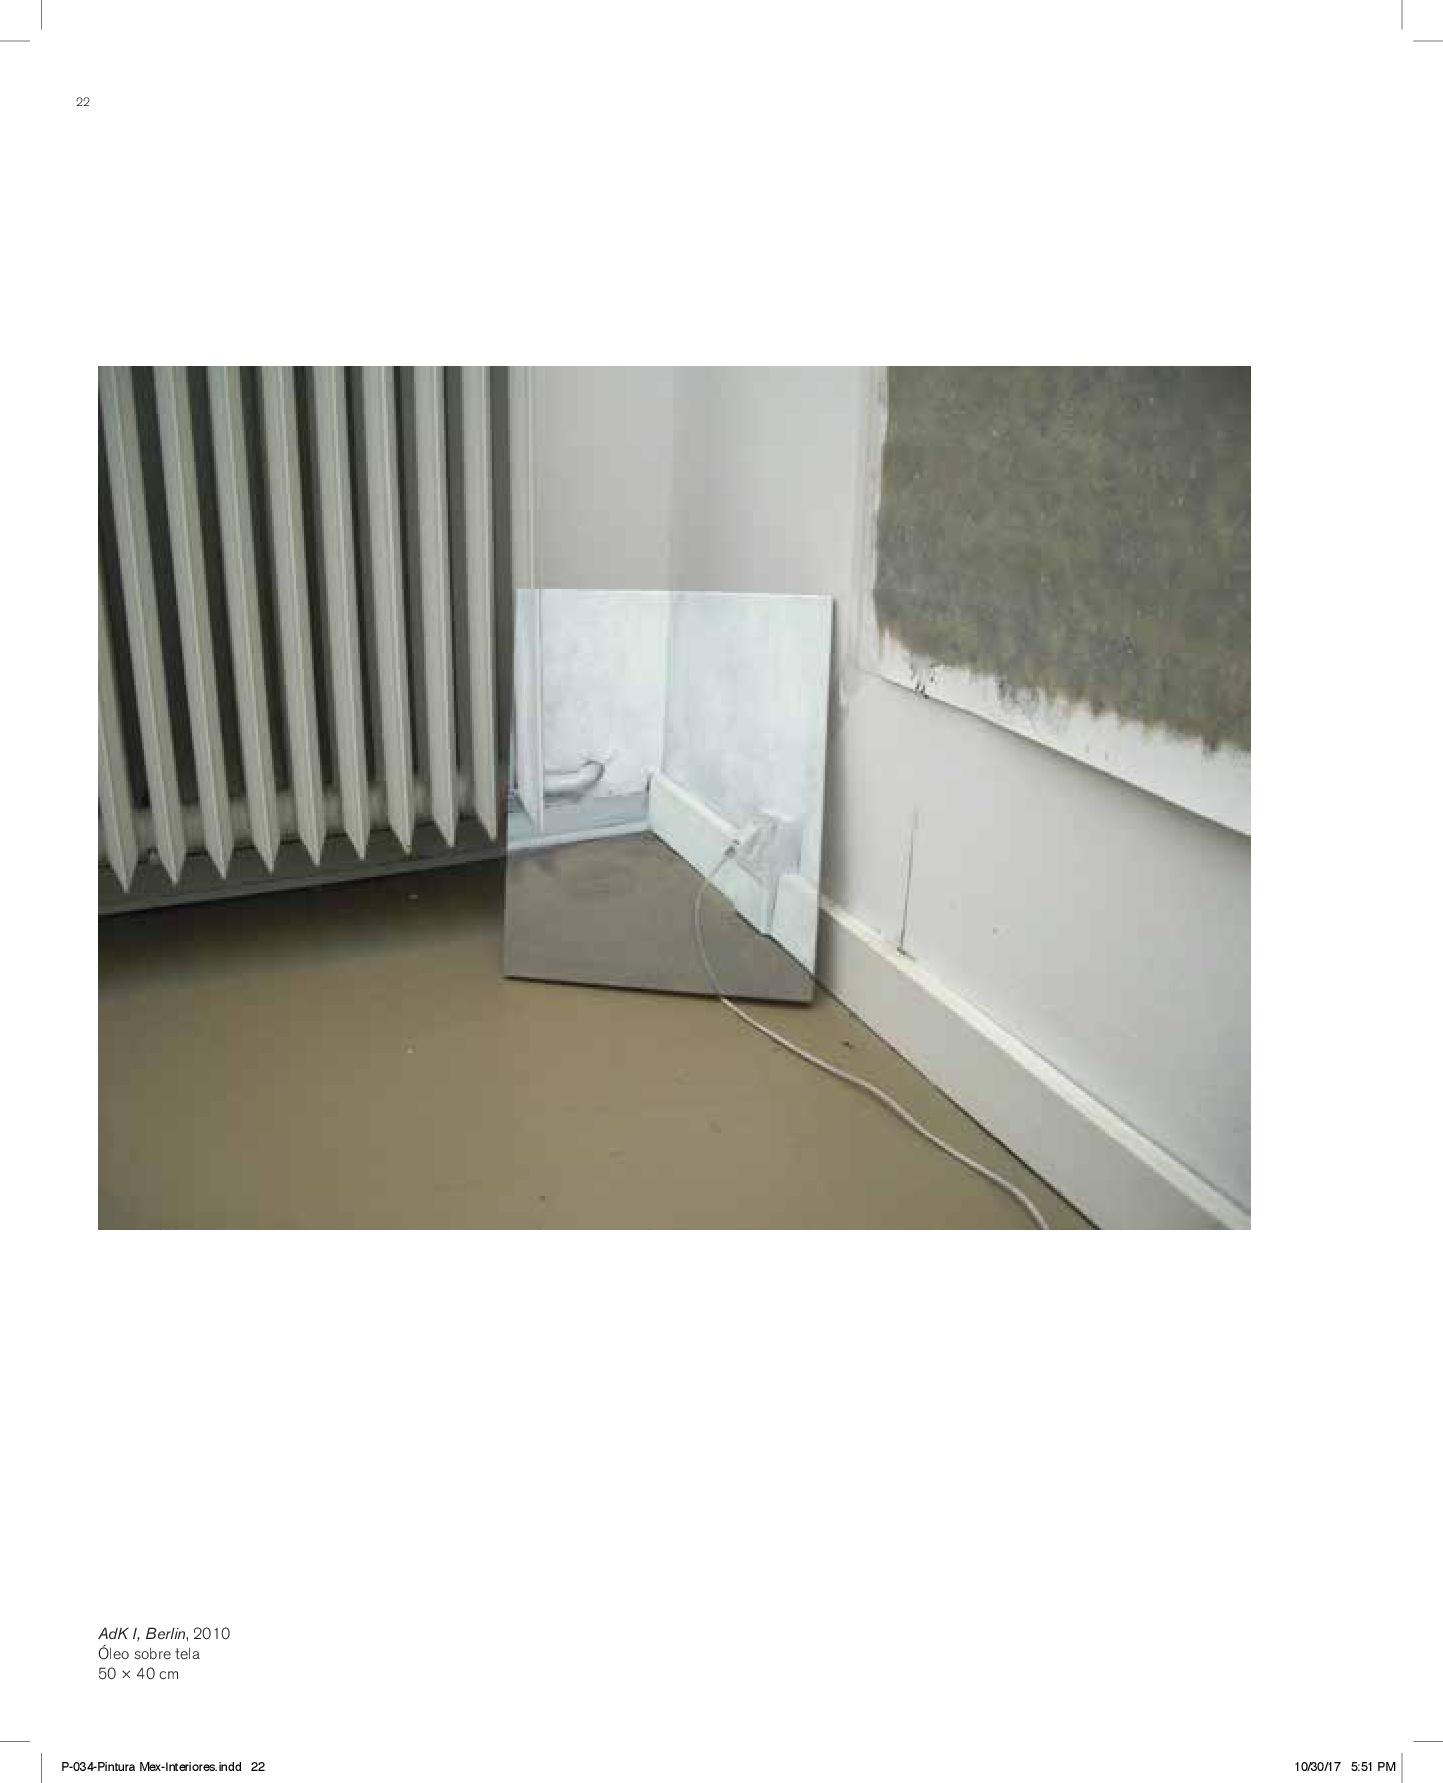 P-034-Pintura-Mex-Interiores-L04-3-022.jpg